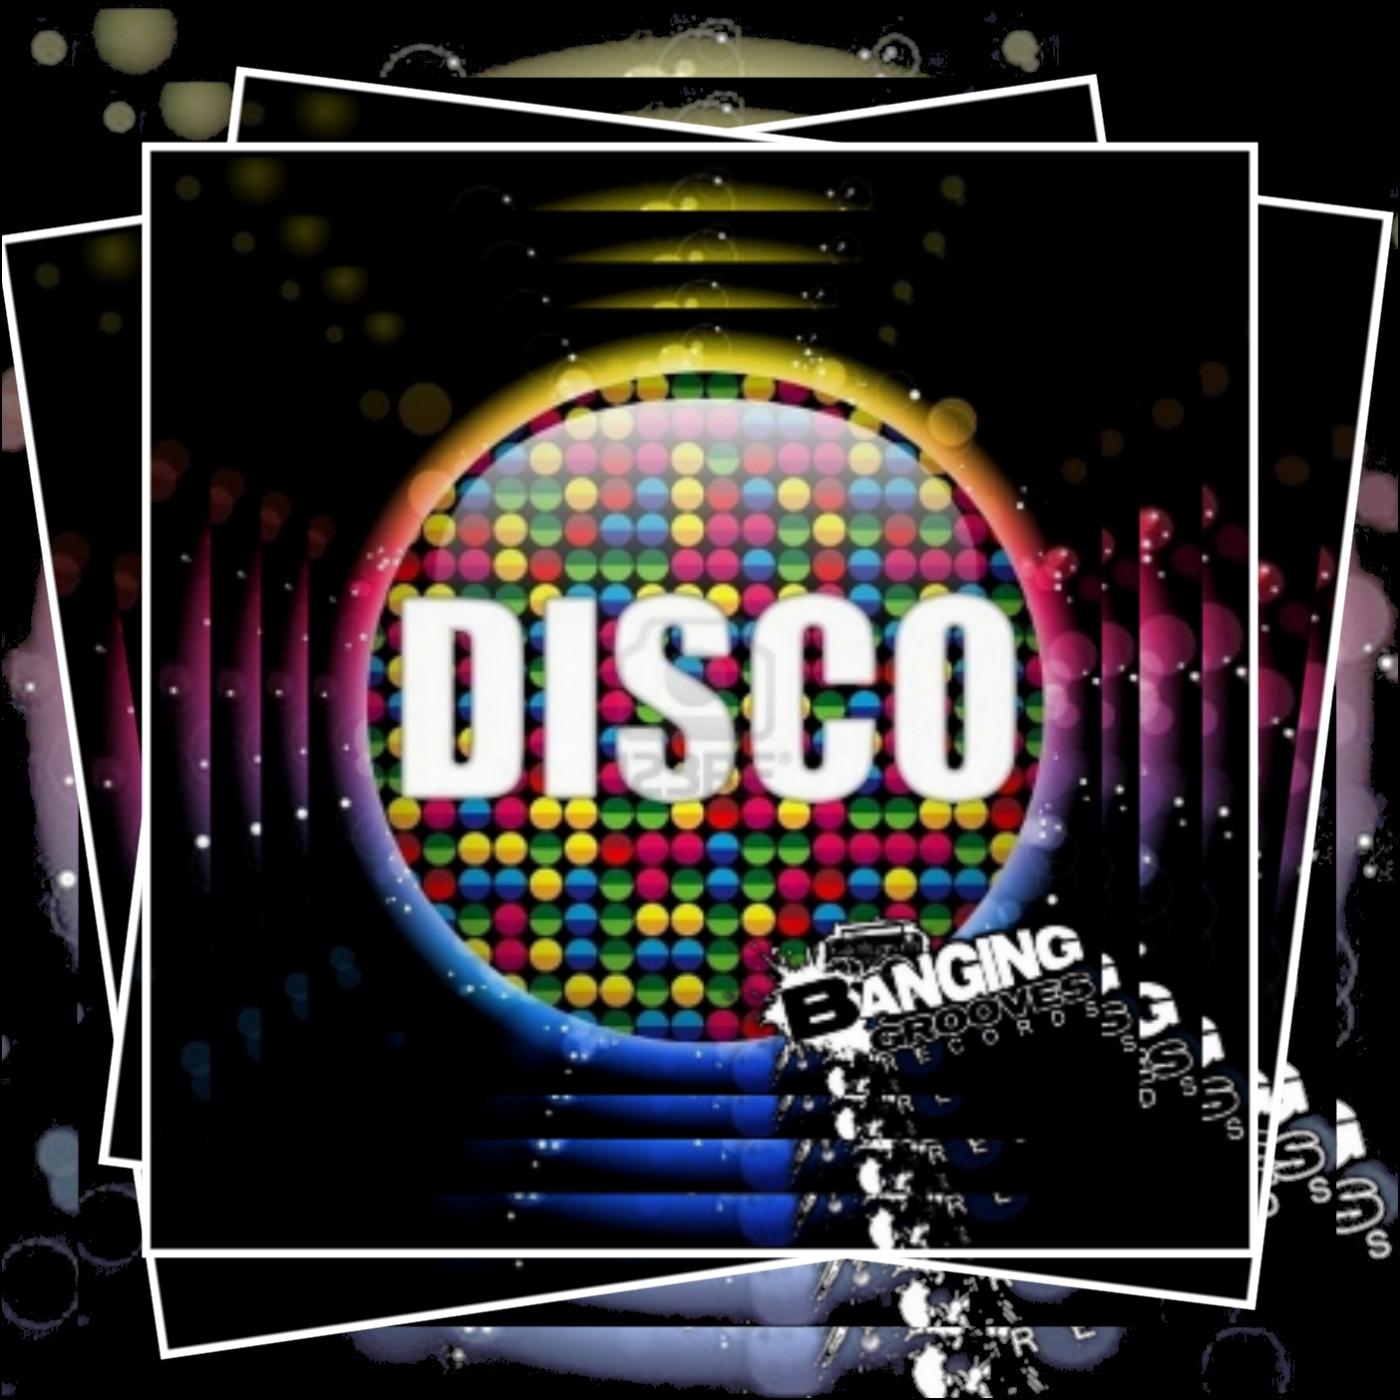 DJ Funsko - SpaceDiscoGroove (Original Mix)